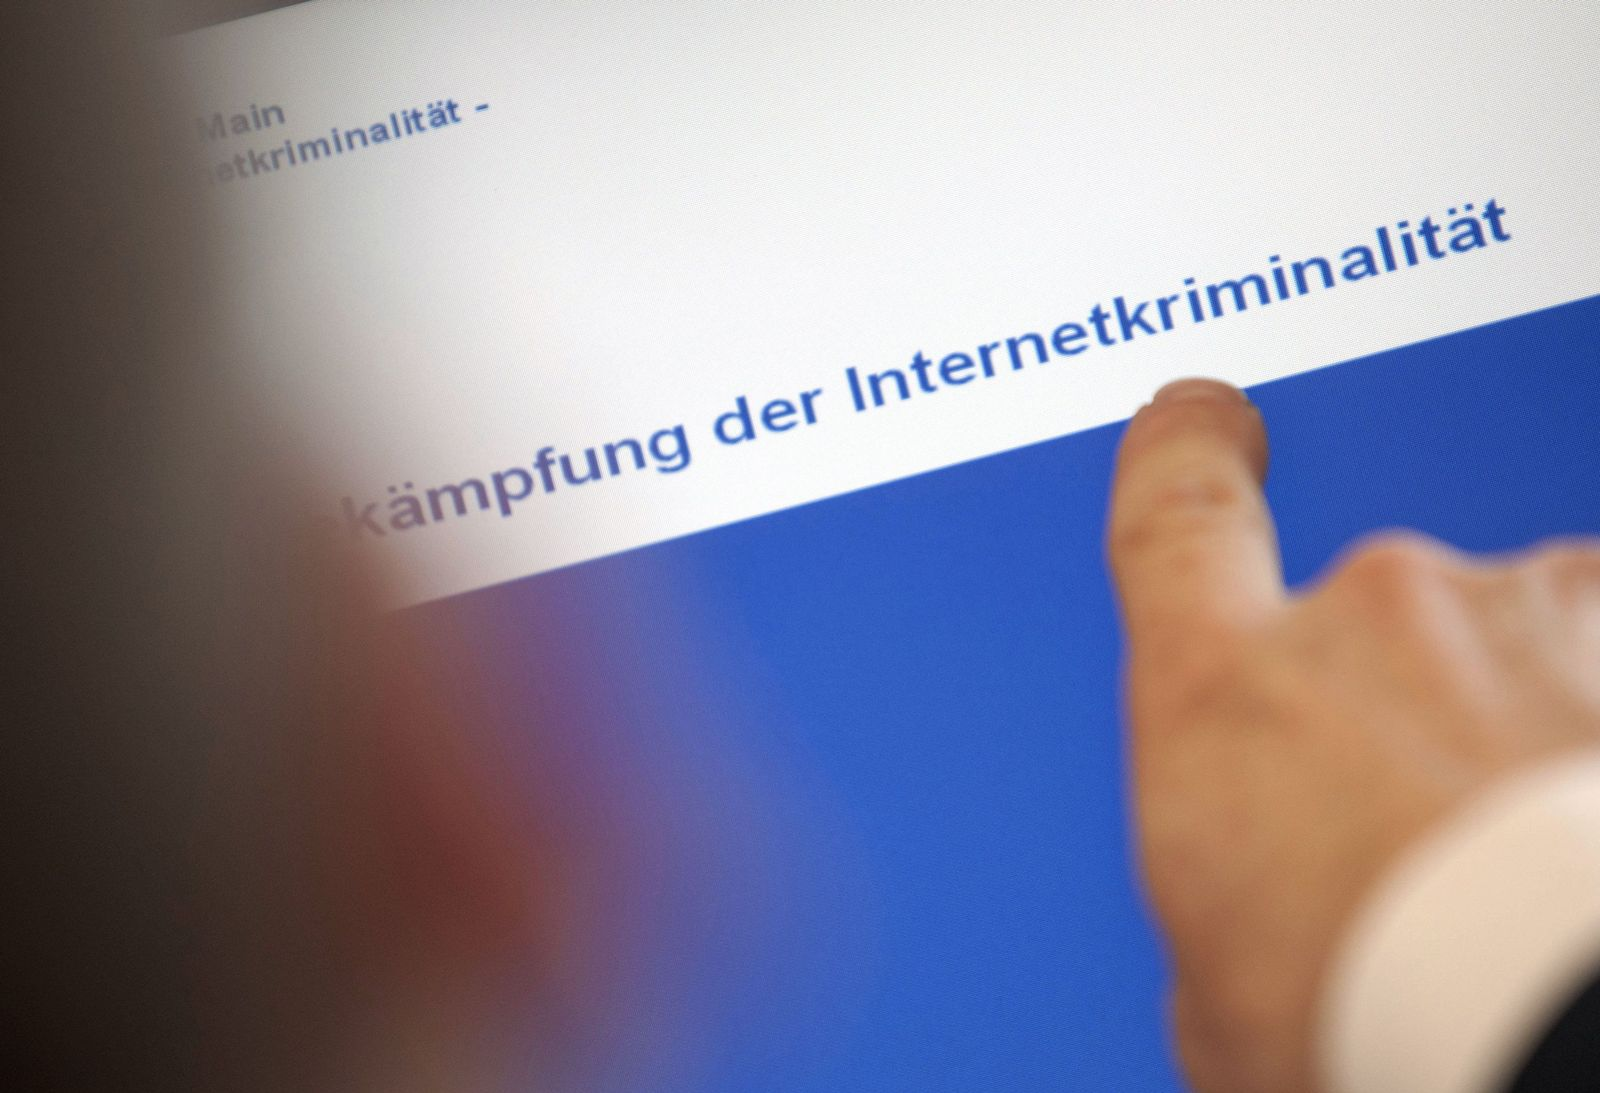 SYMBOLBILD Internetkrminalität / Internet